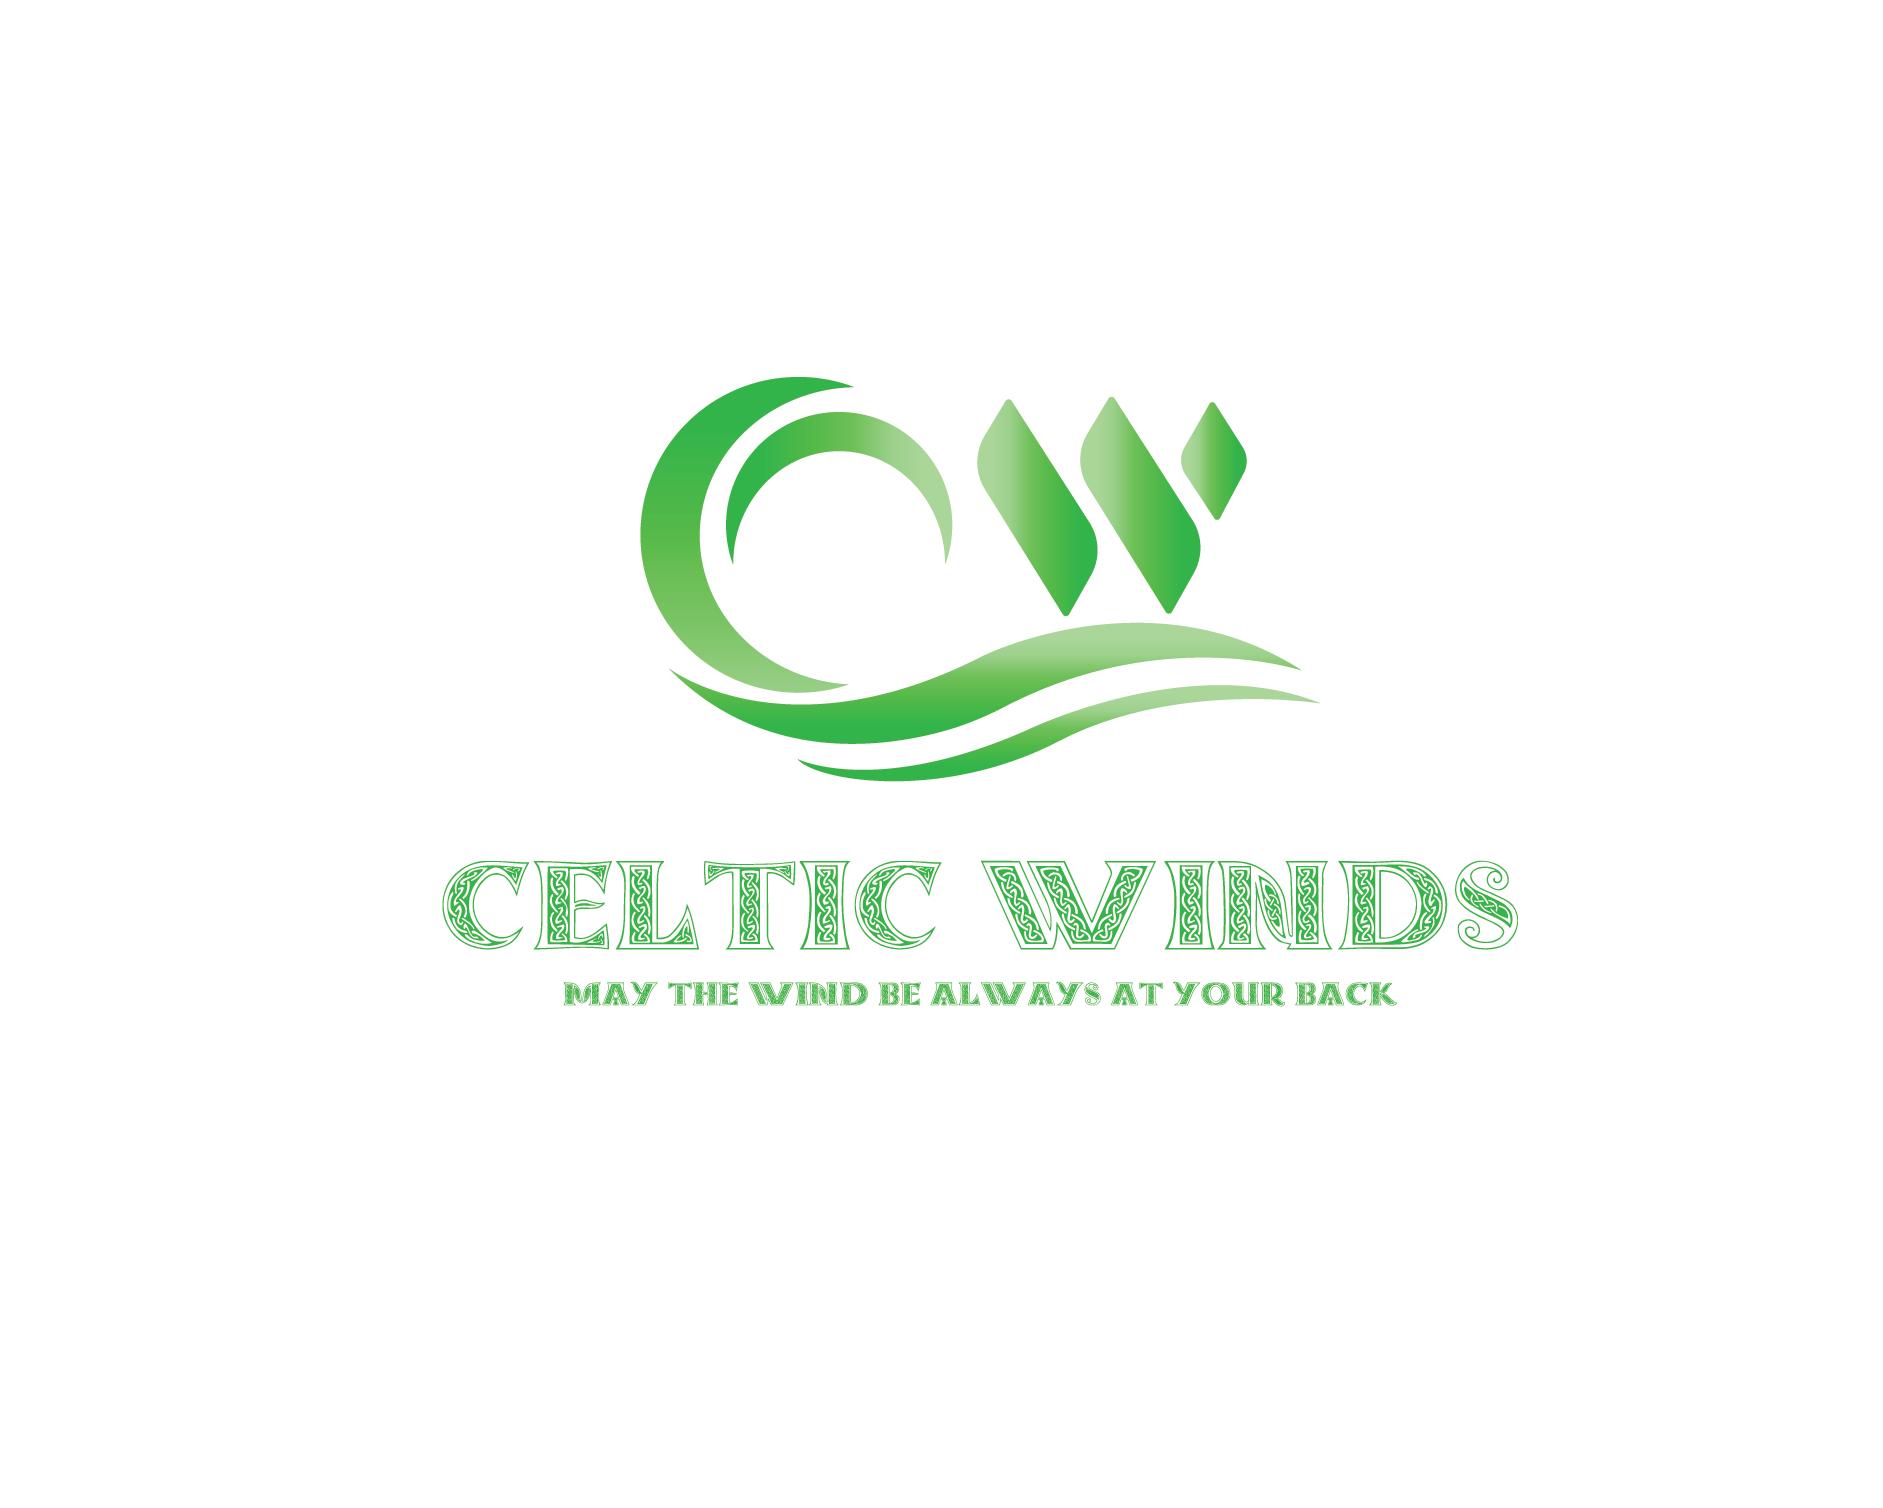 Deranalogo I Will Design A Sports Modern Minimalist Professional Logo Designs For 15 On Fiverr Com Professional Logo Design Logos Logo Design